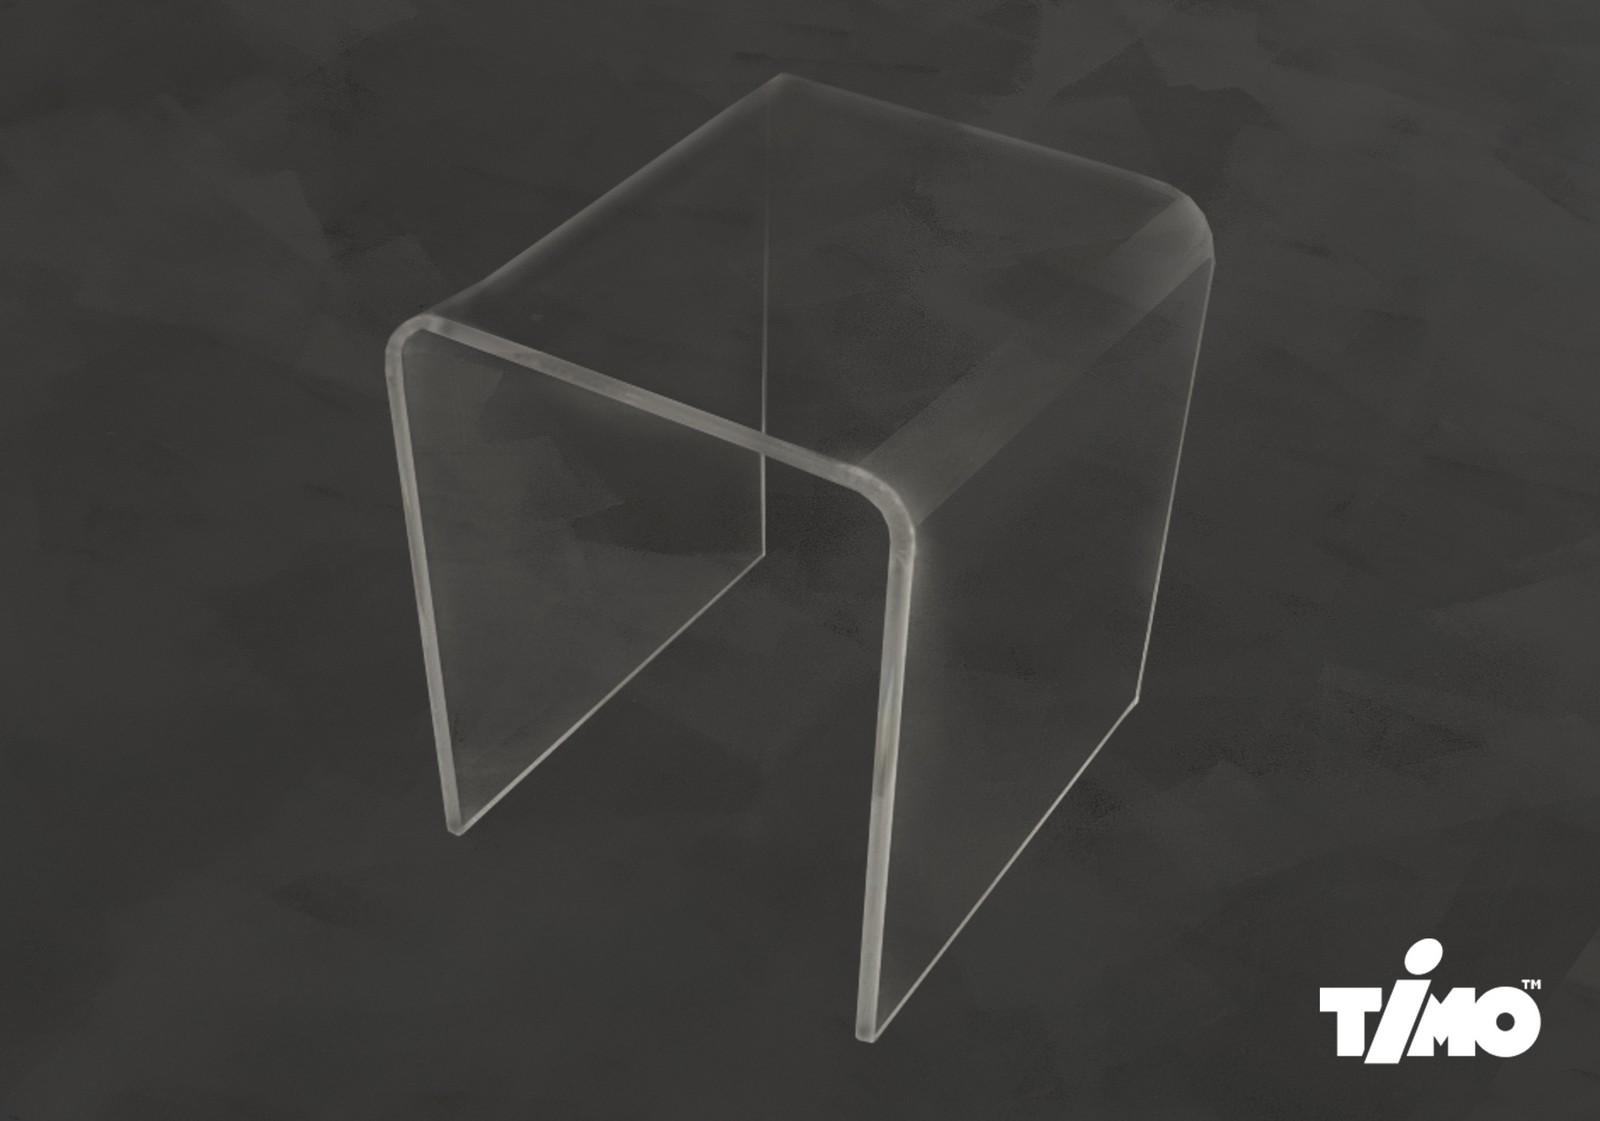 Душевая кабина Timo ILMA 701